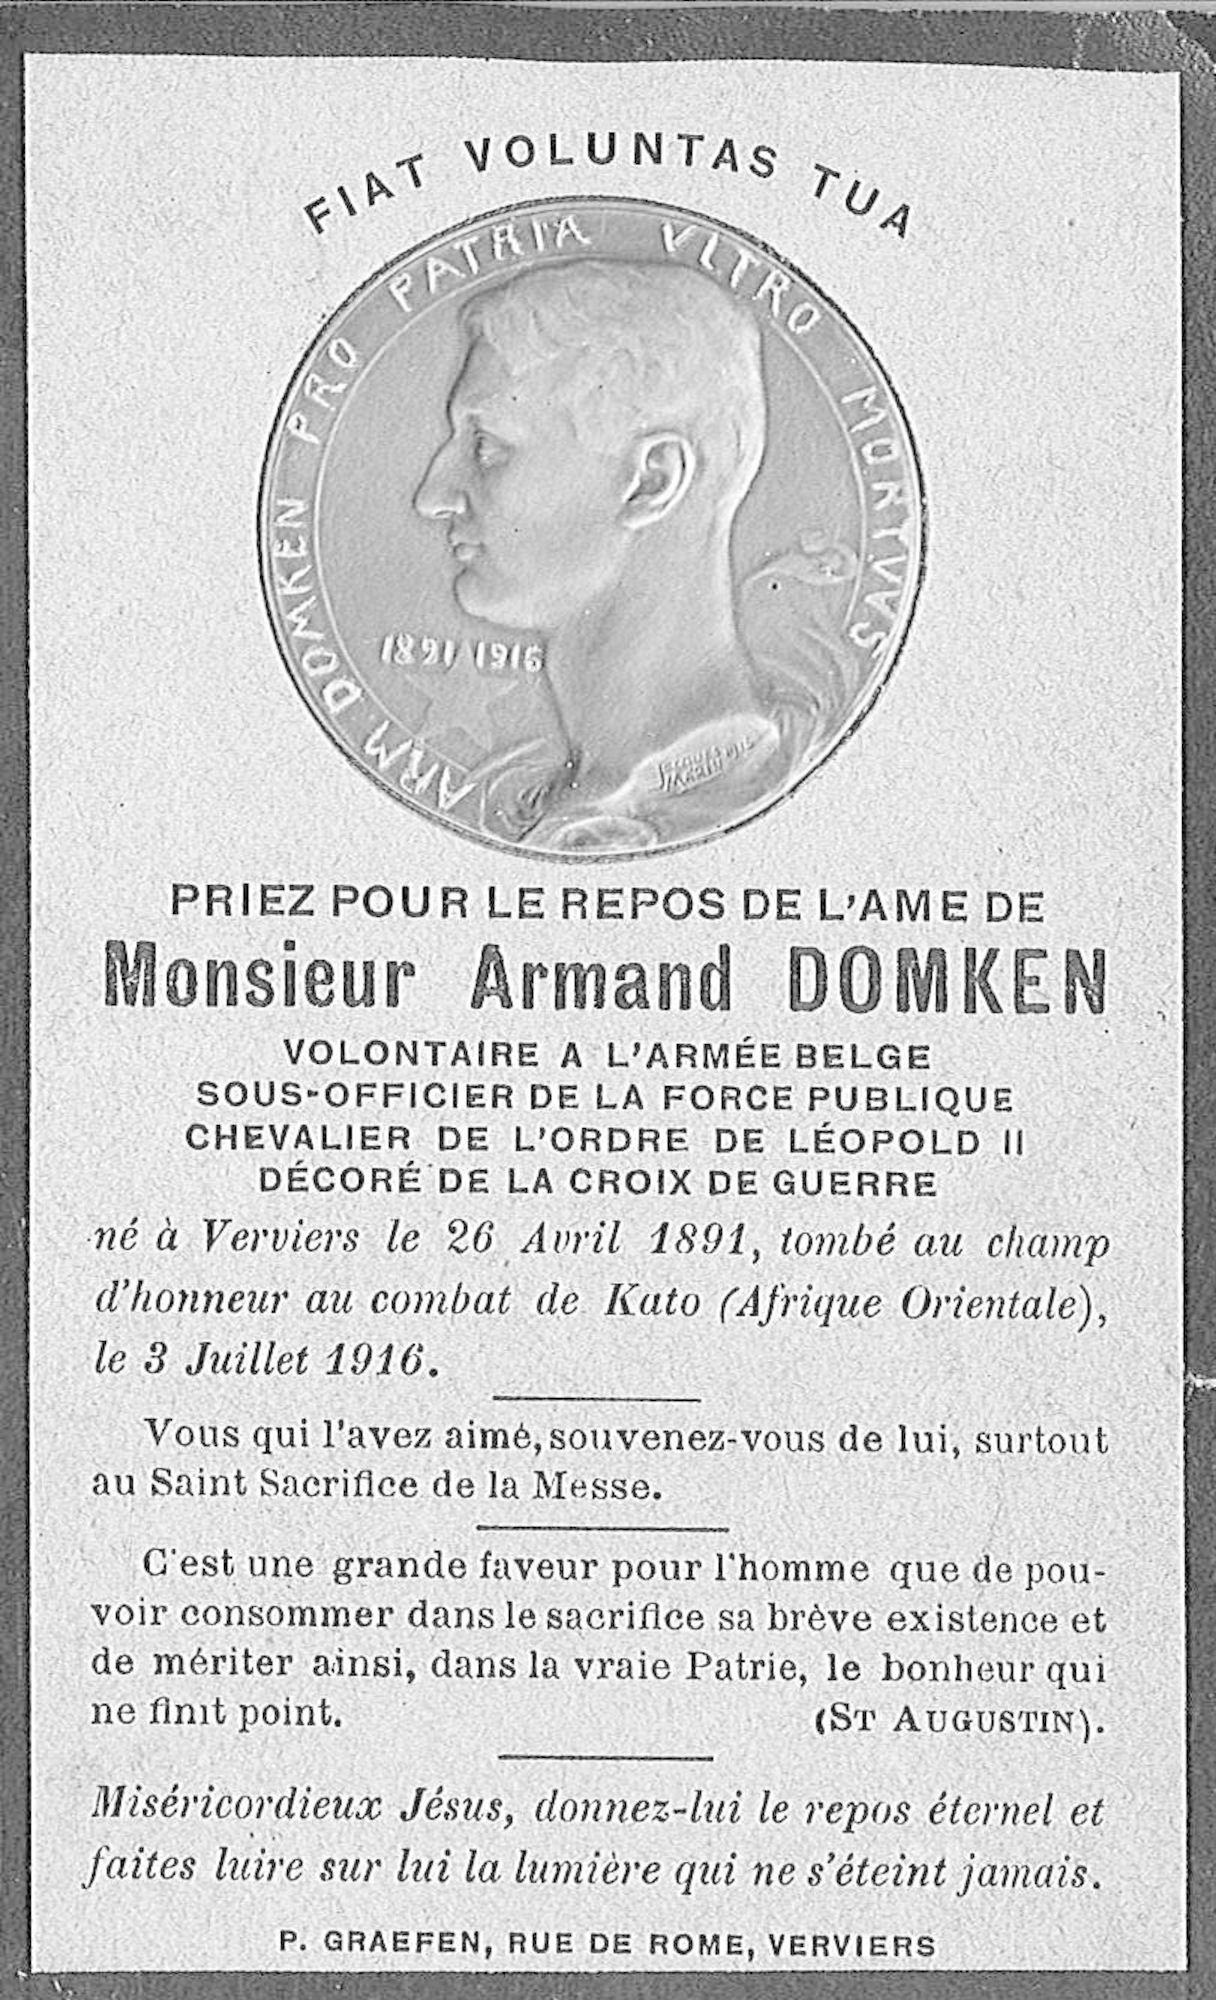 Armand Domken